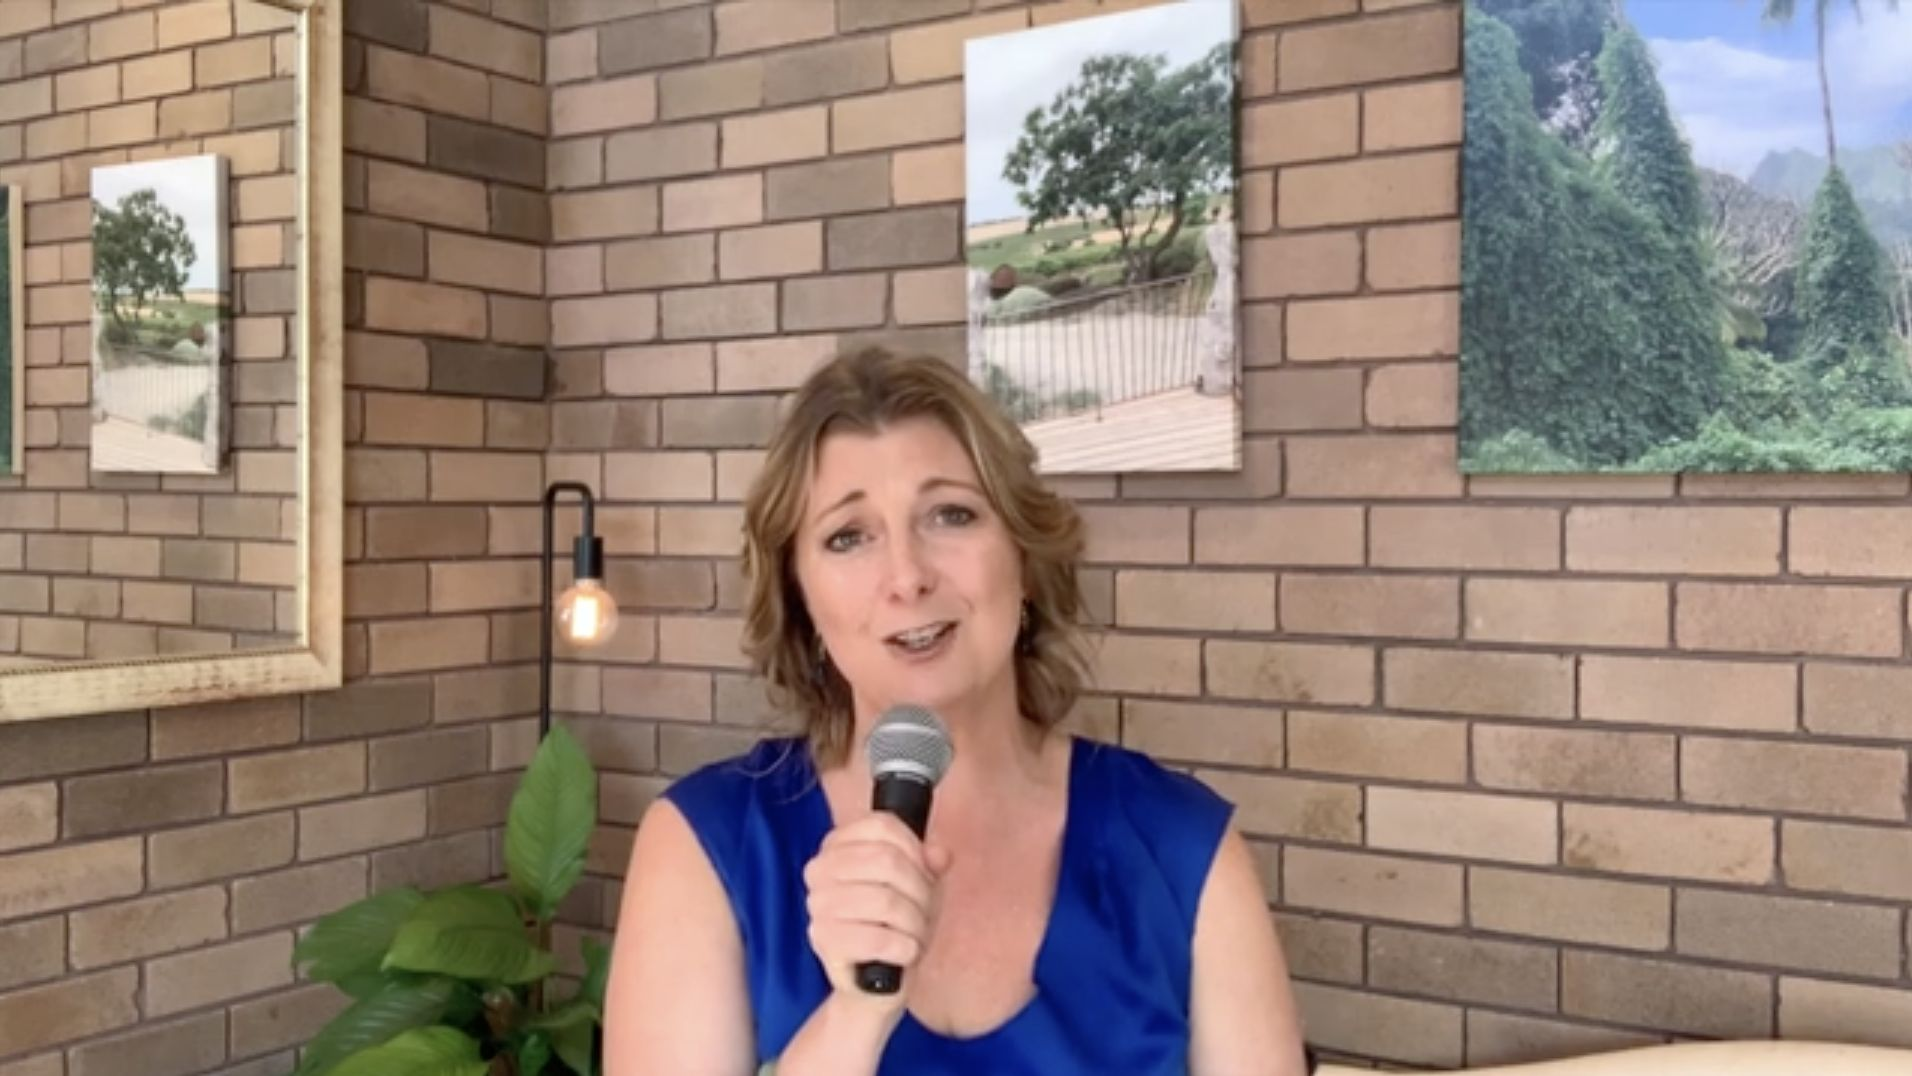 Solo vocal workshop – 4. Audition tips part 2